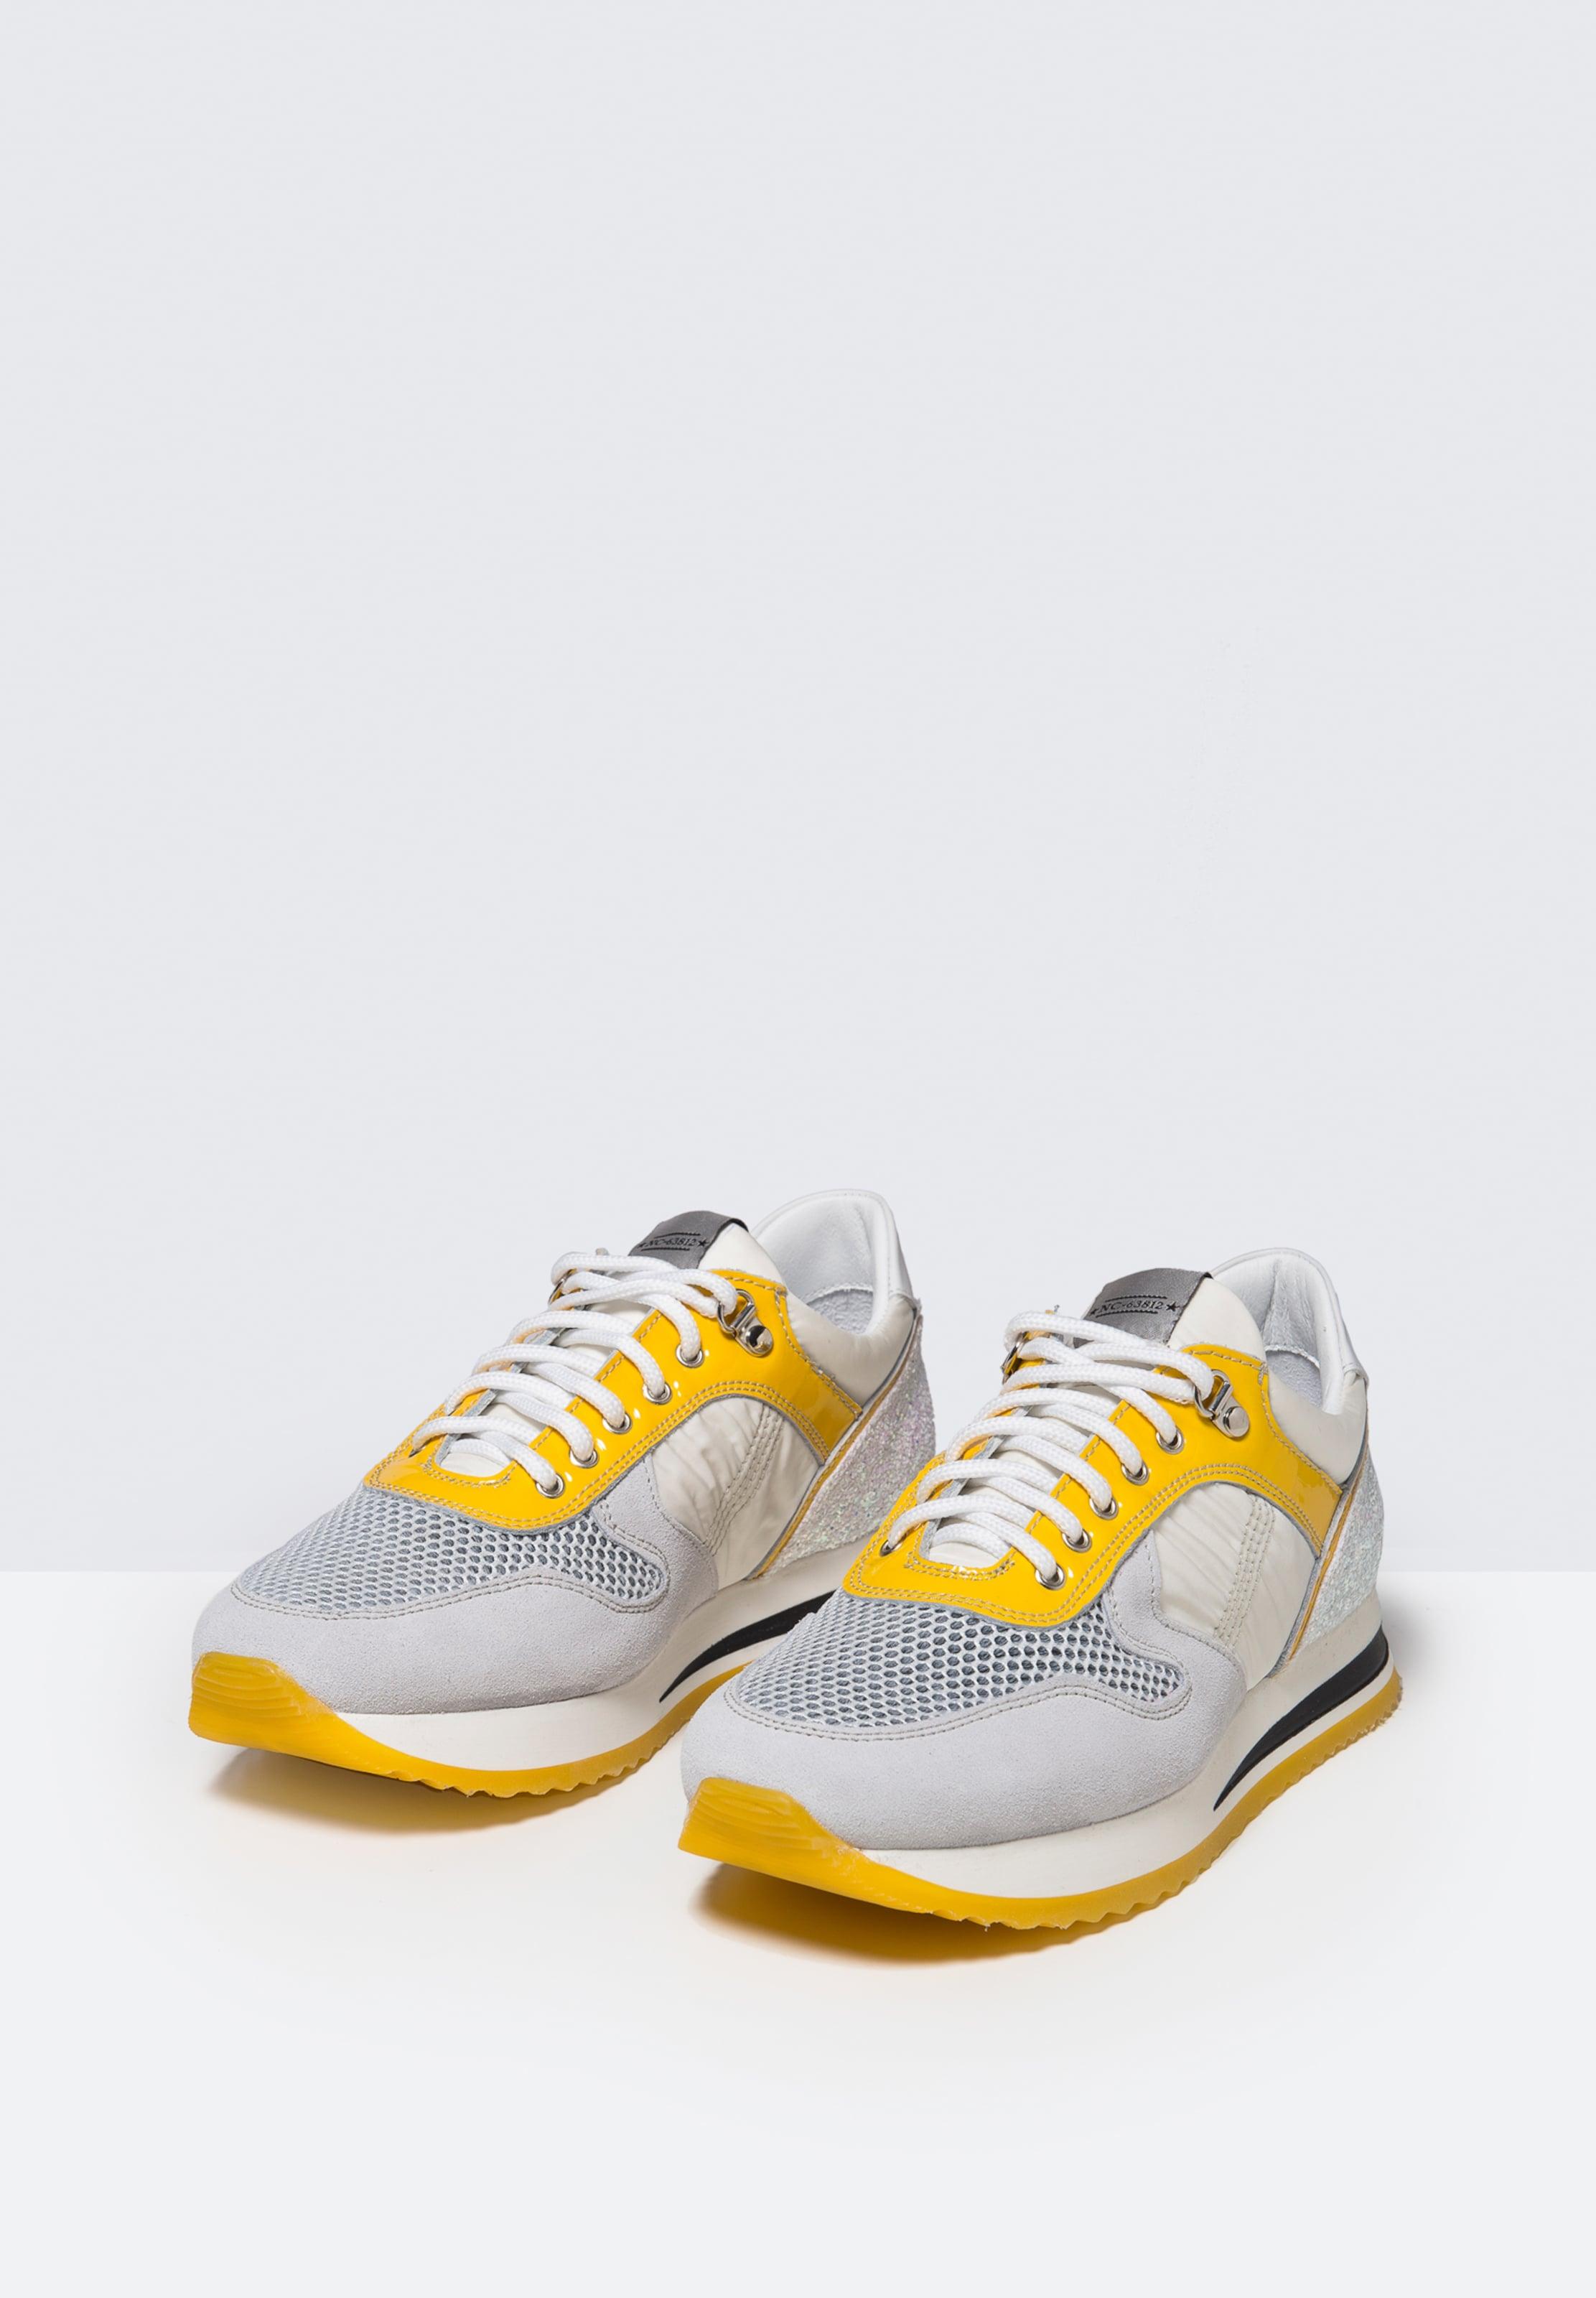 15' In Noclaim Sneaker GelbHellgrau Weiß 'zelda Okn80PwX